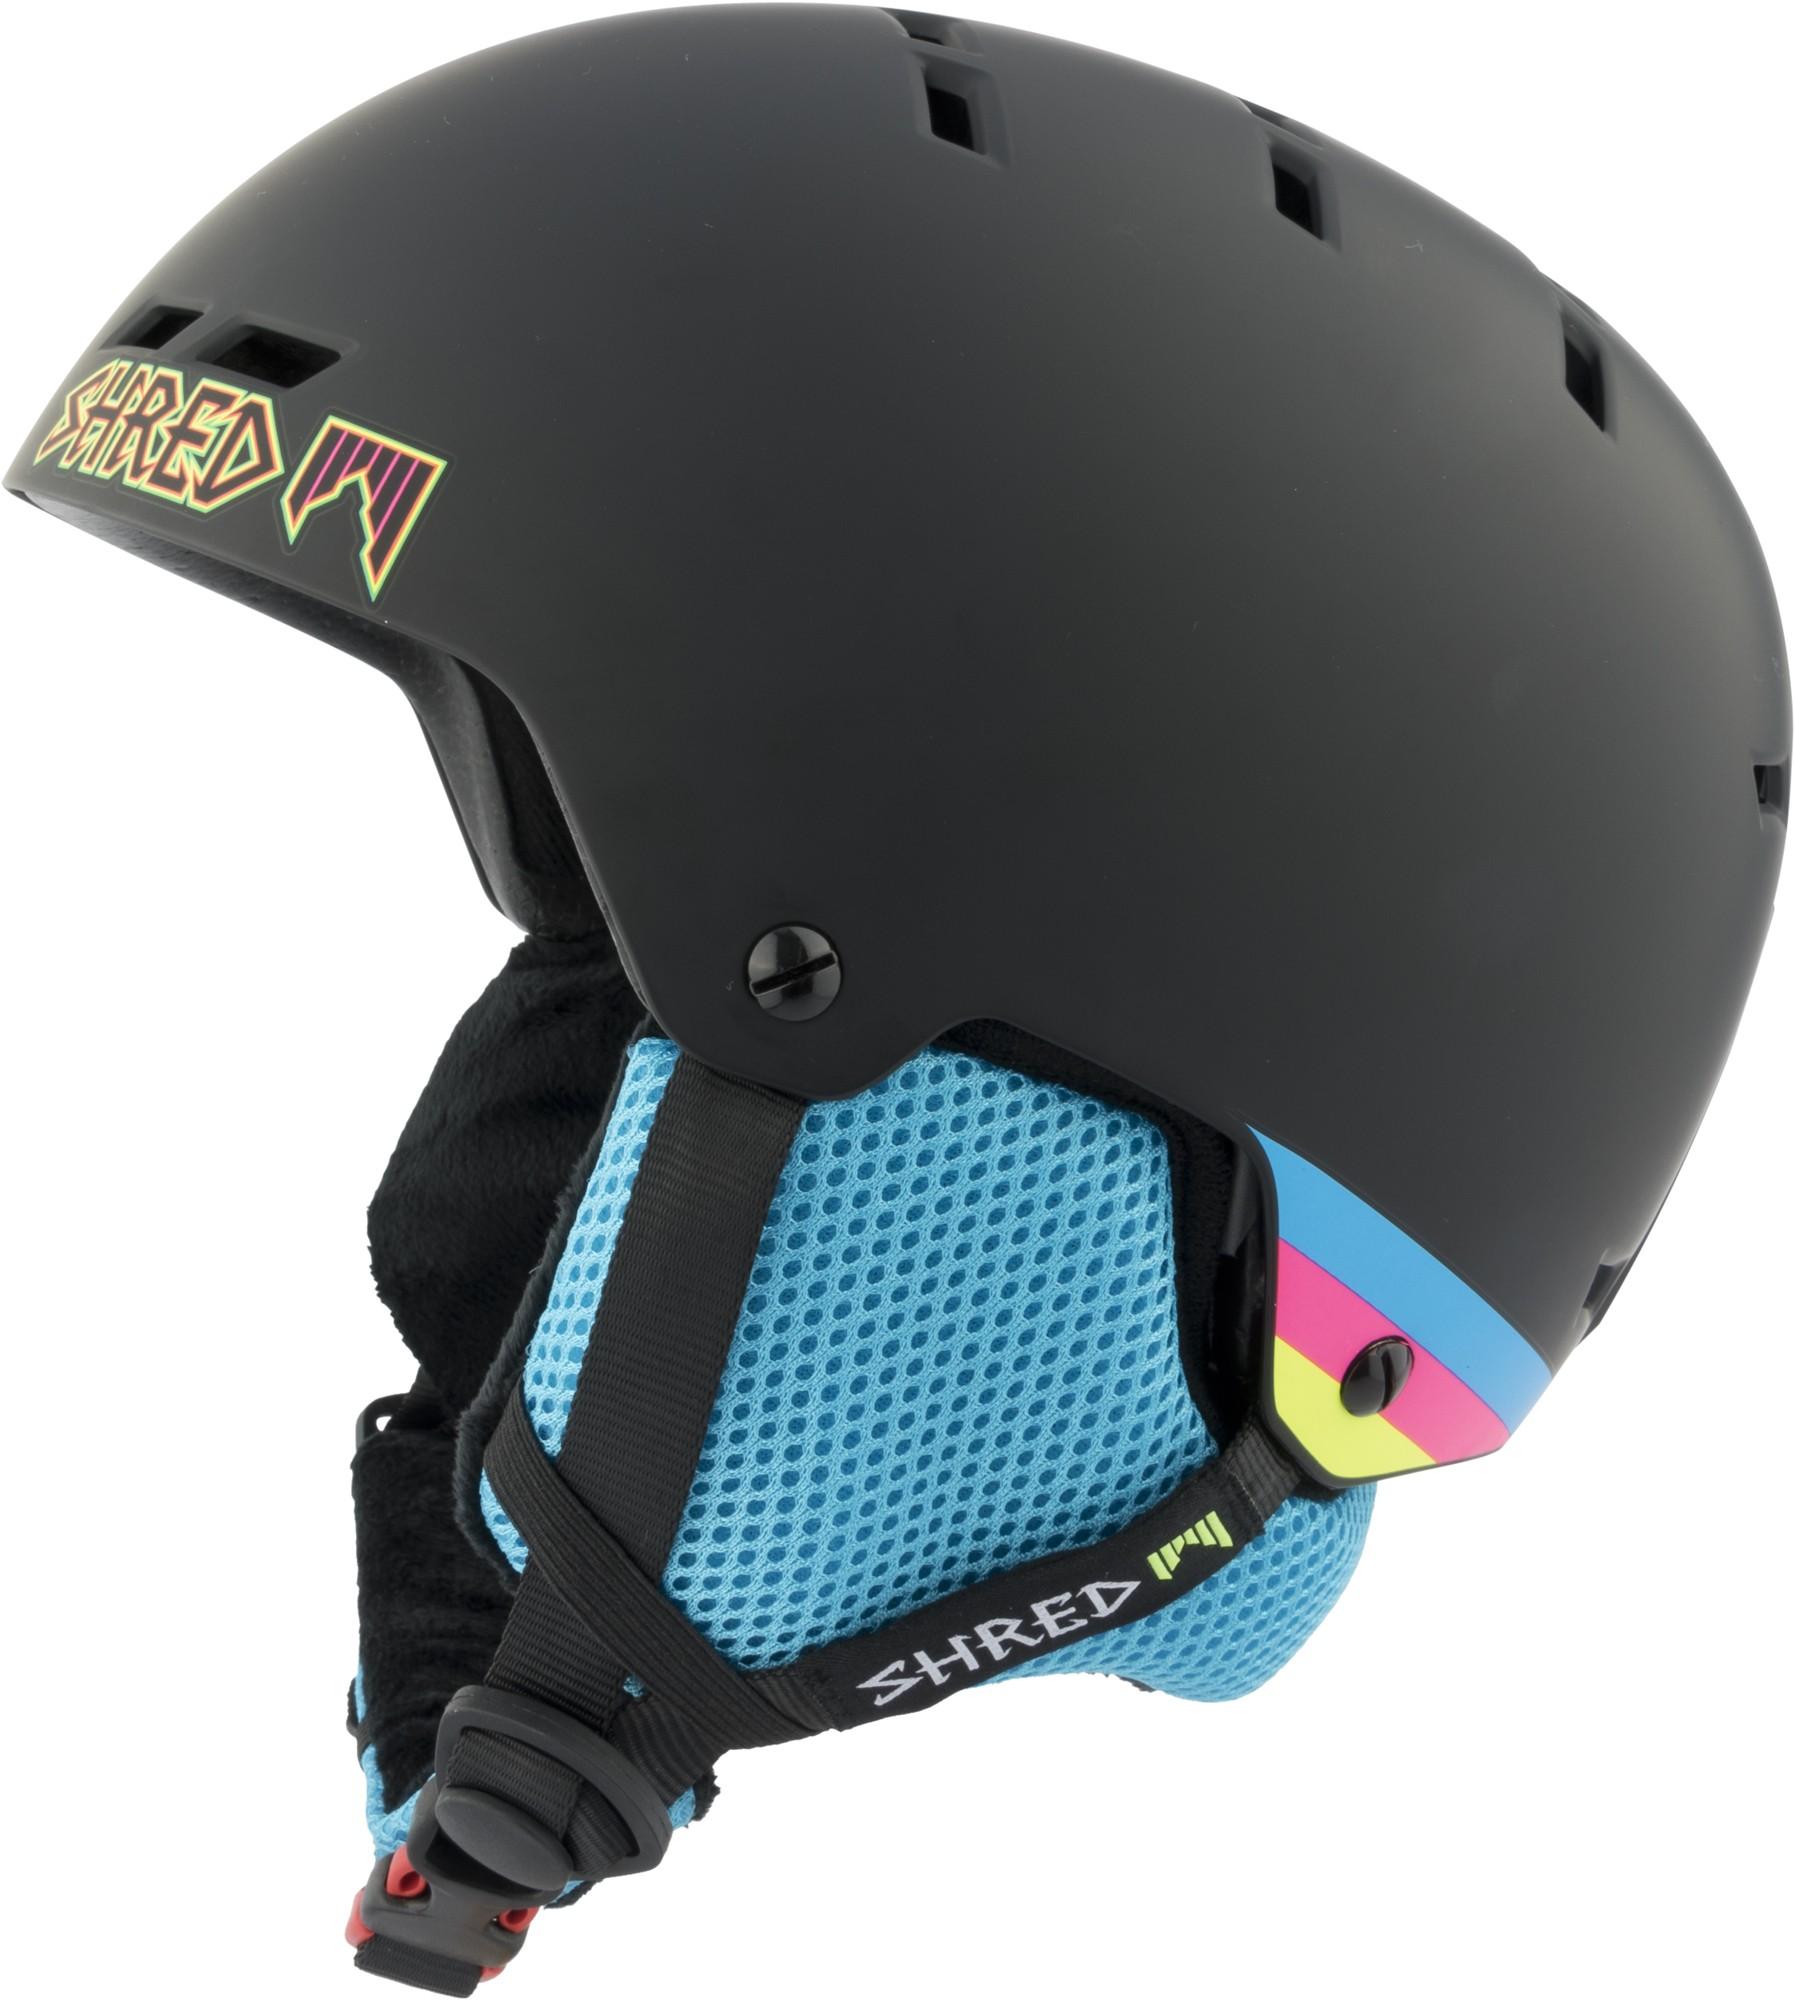 Shred BUMPER warm SHRASTA ski helmet, 2017